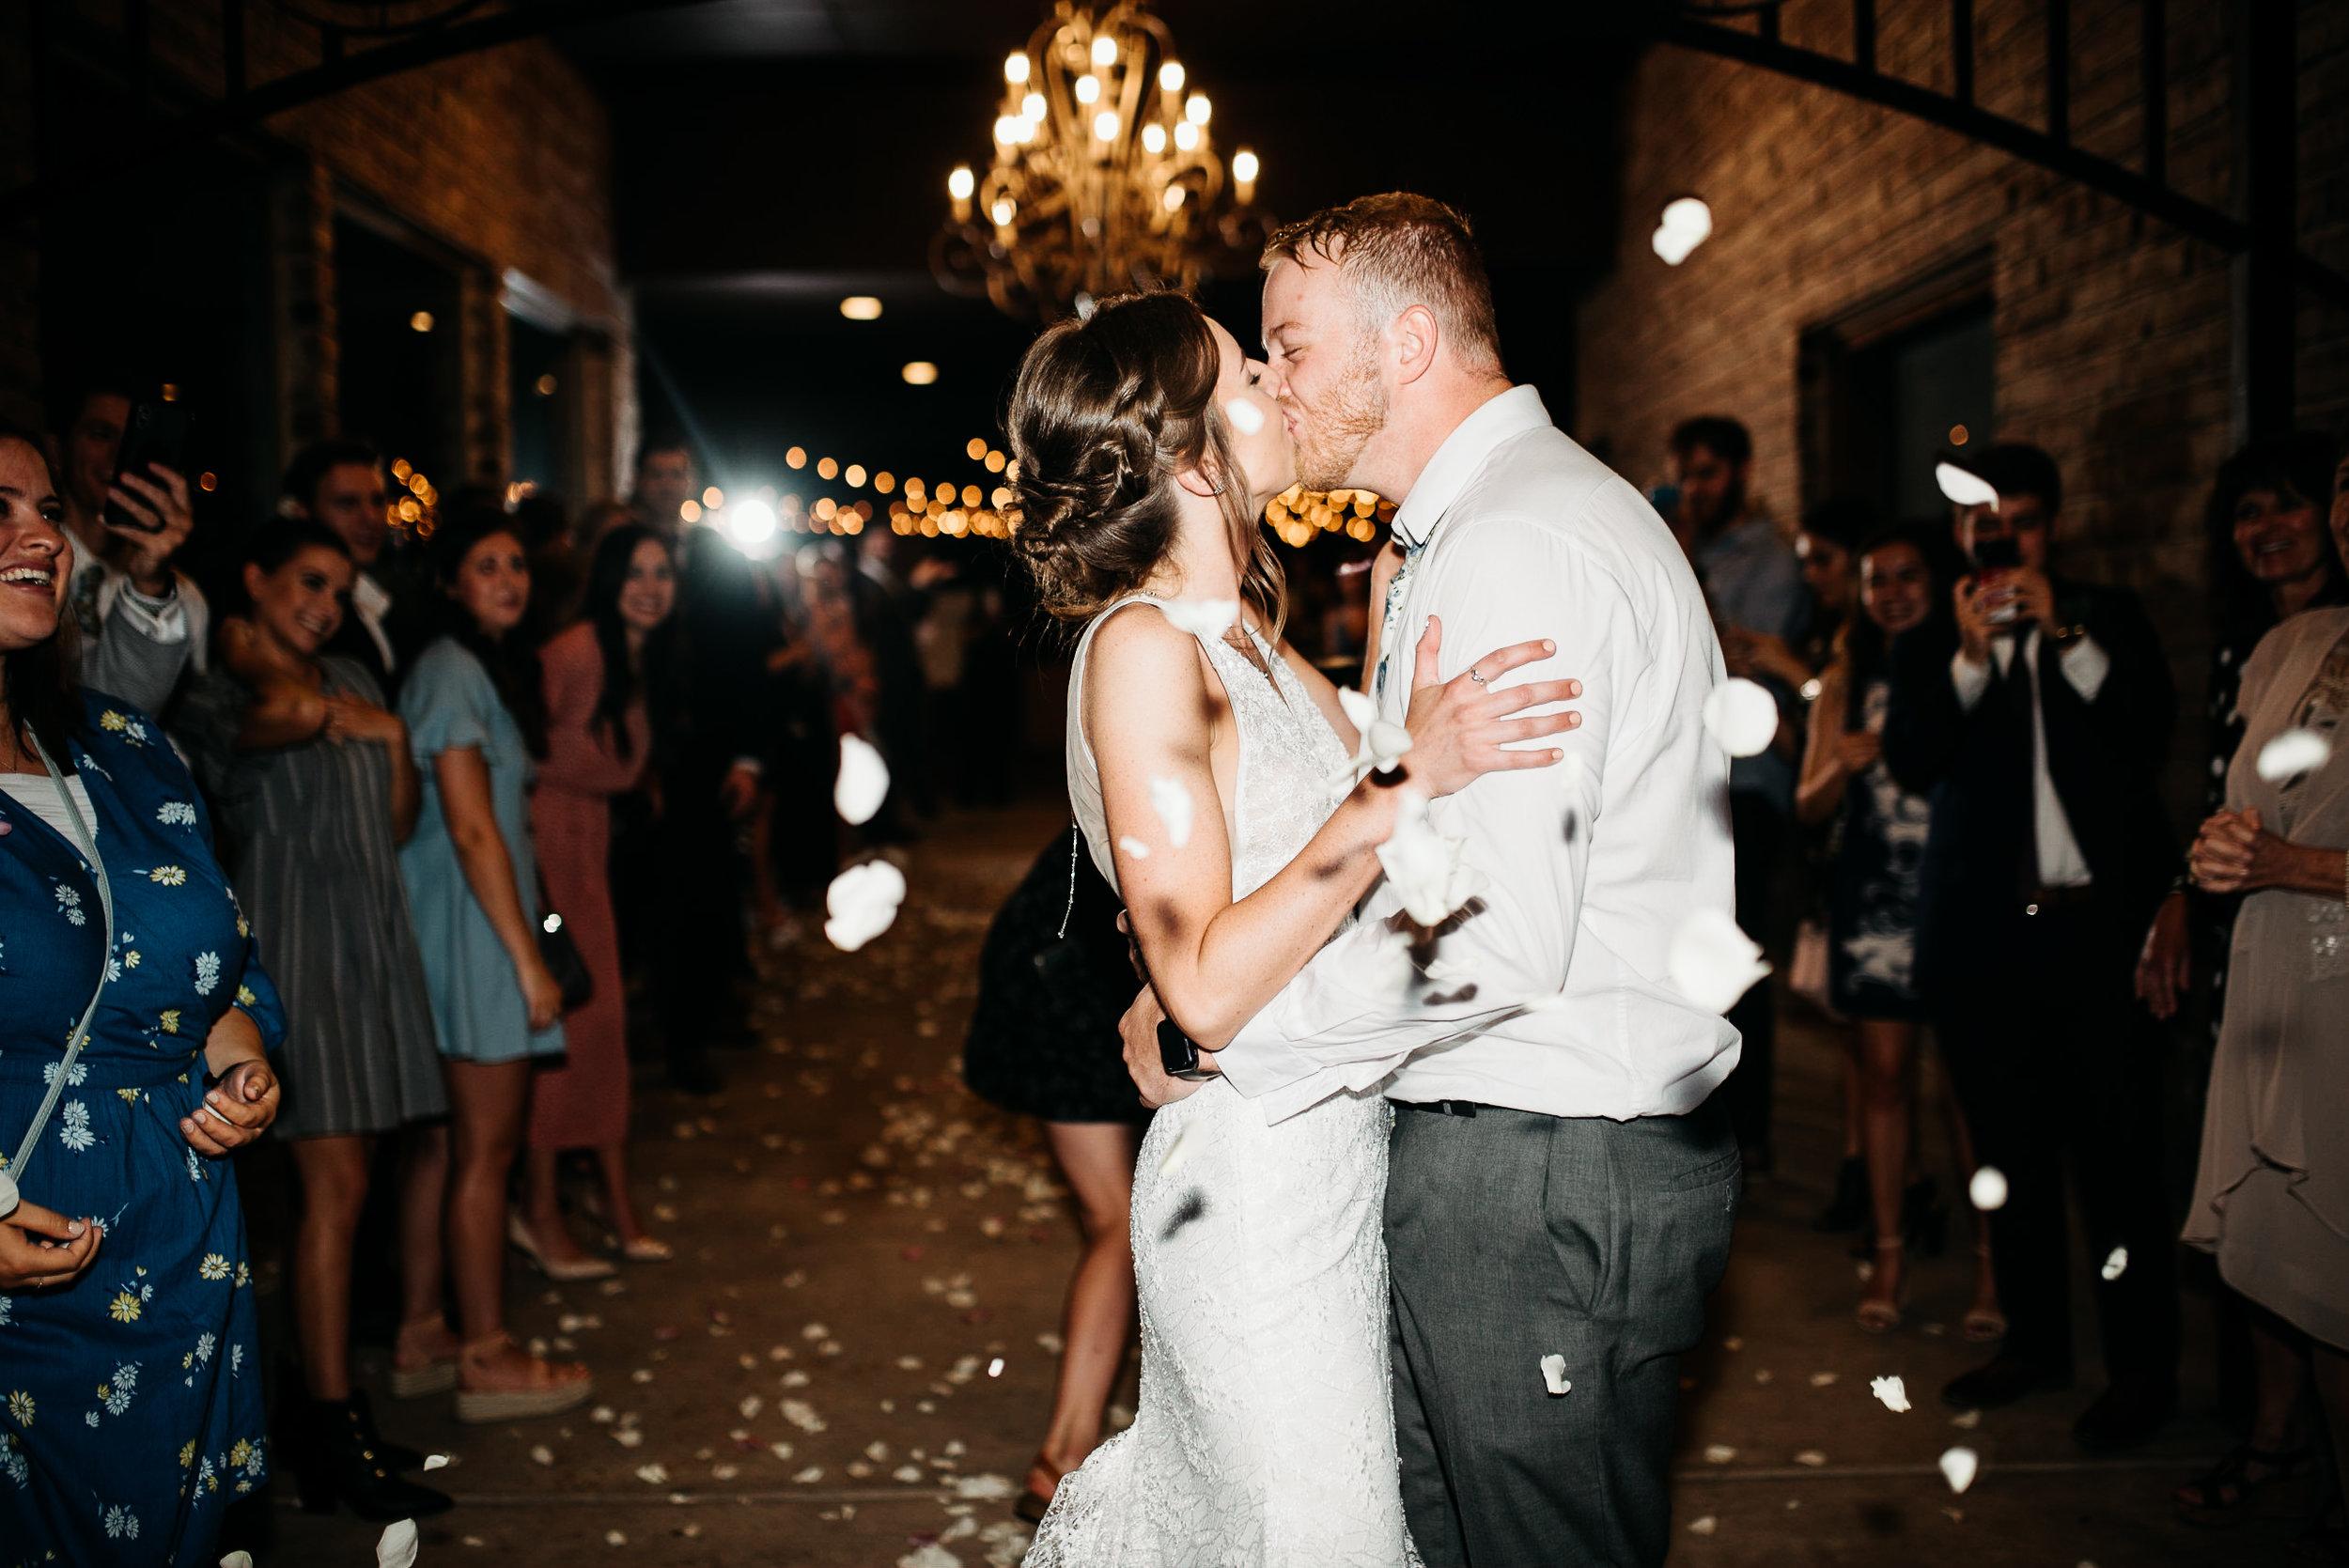 okc-wedding-photographer-coles-garden-wedding-okc-best-wedding-photographers-200.jpg